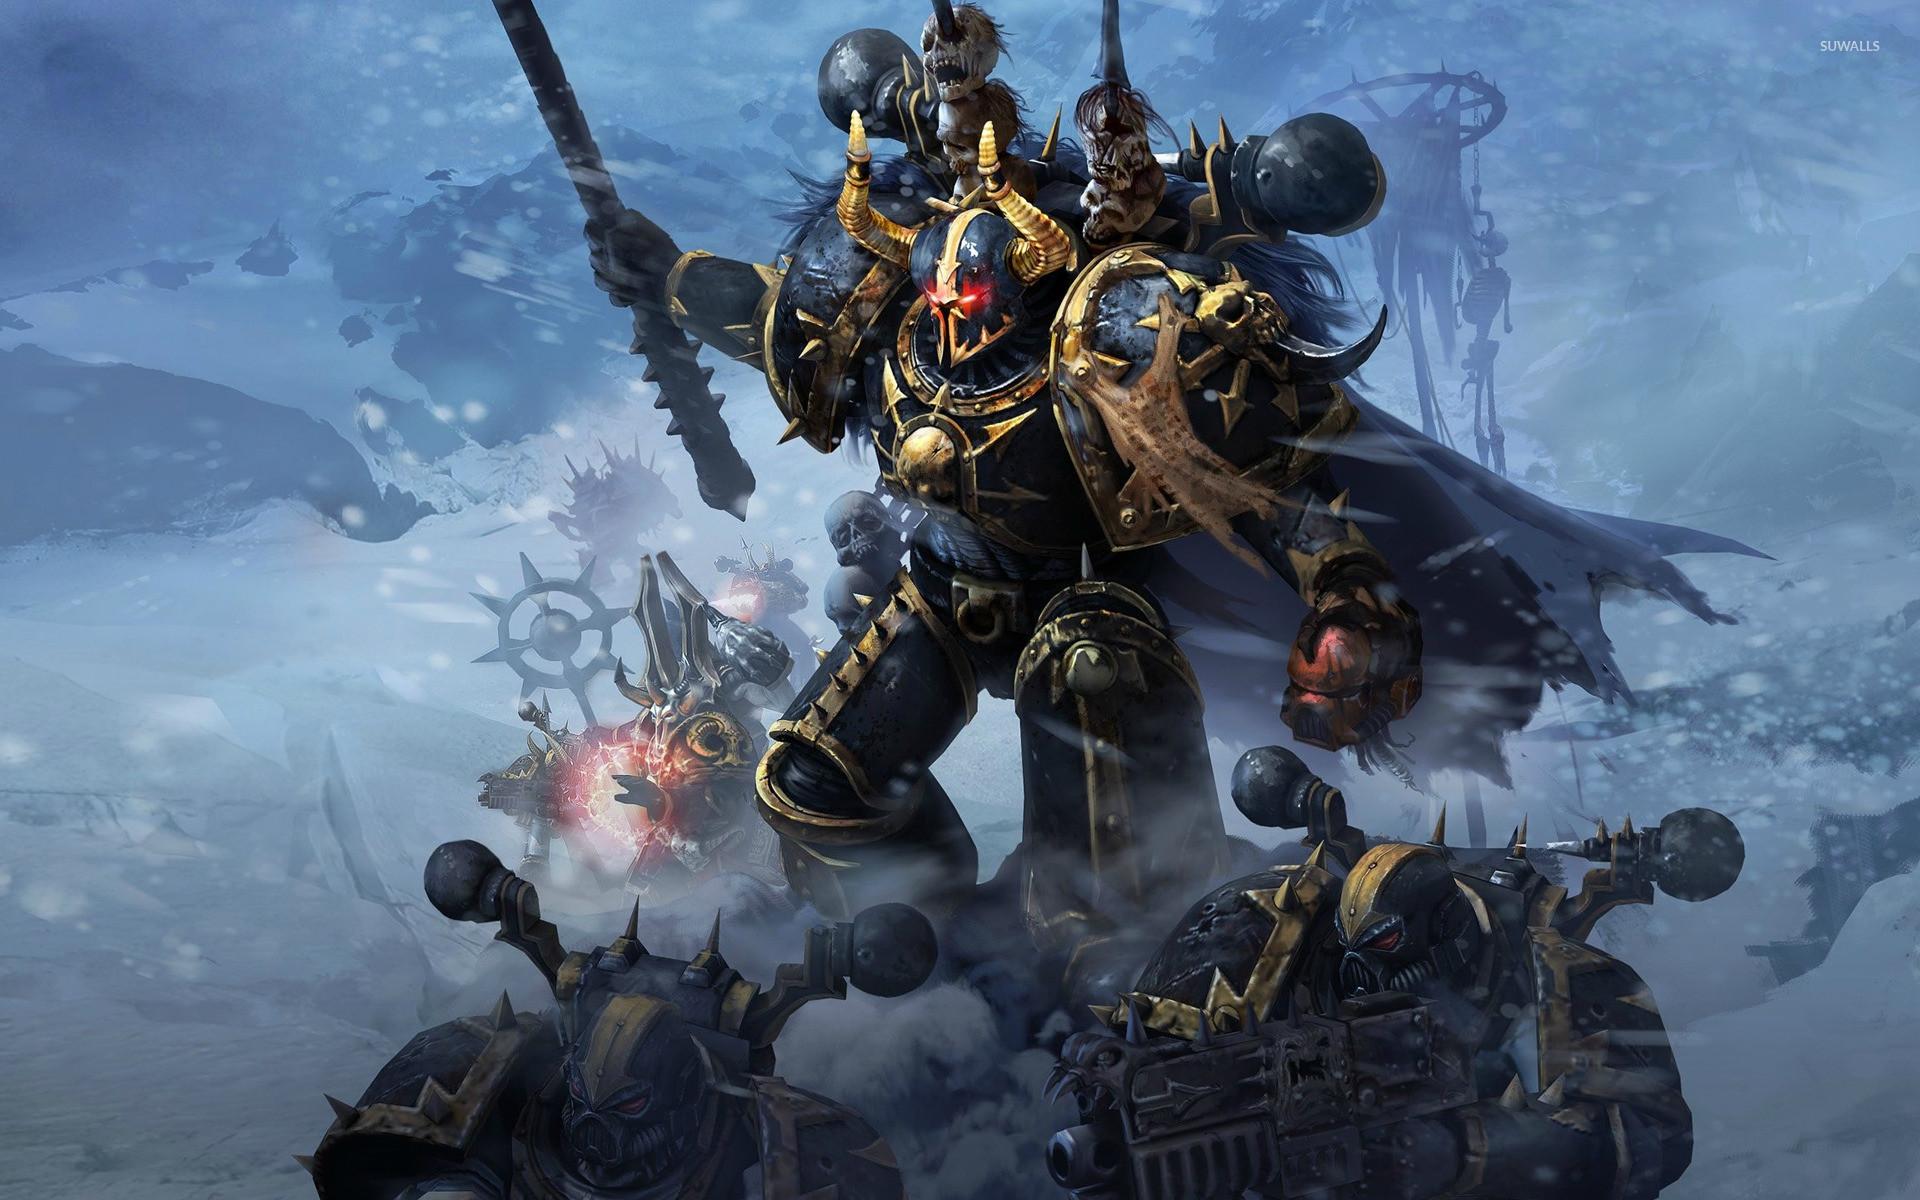 Res: 1920x1200, Warhammer 40,000: Space Marine wallpaper